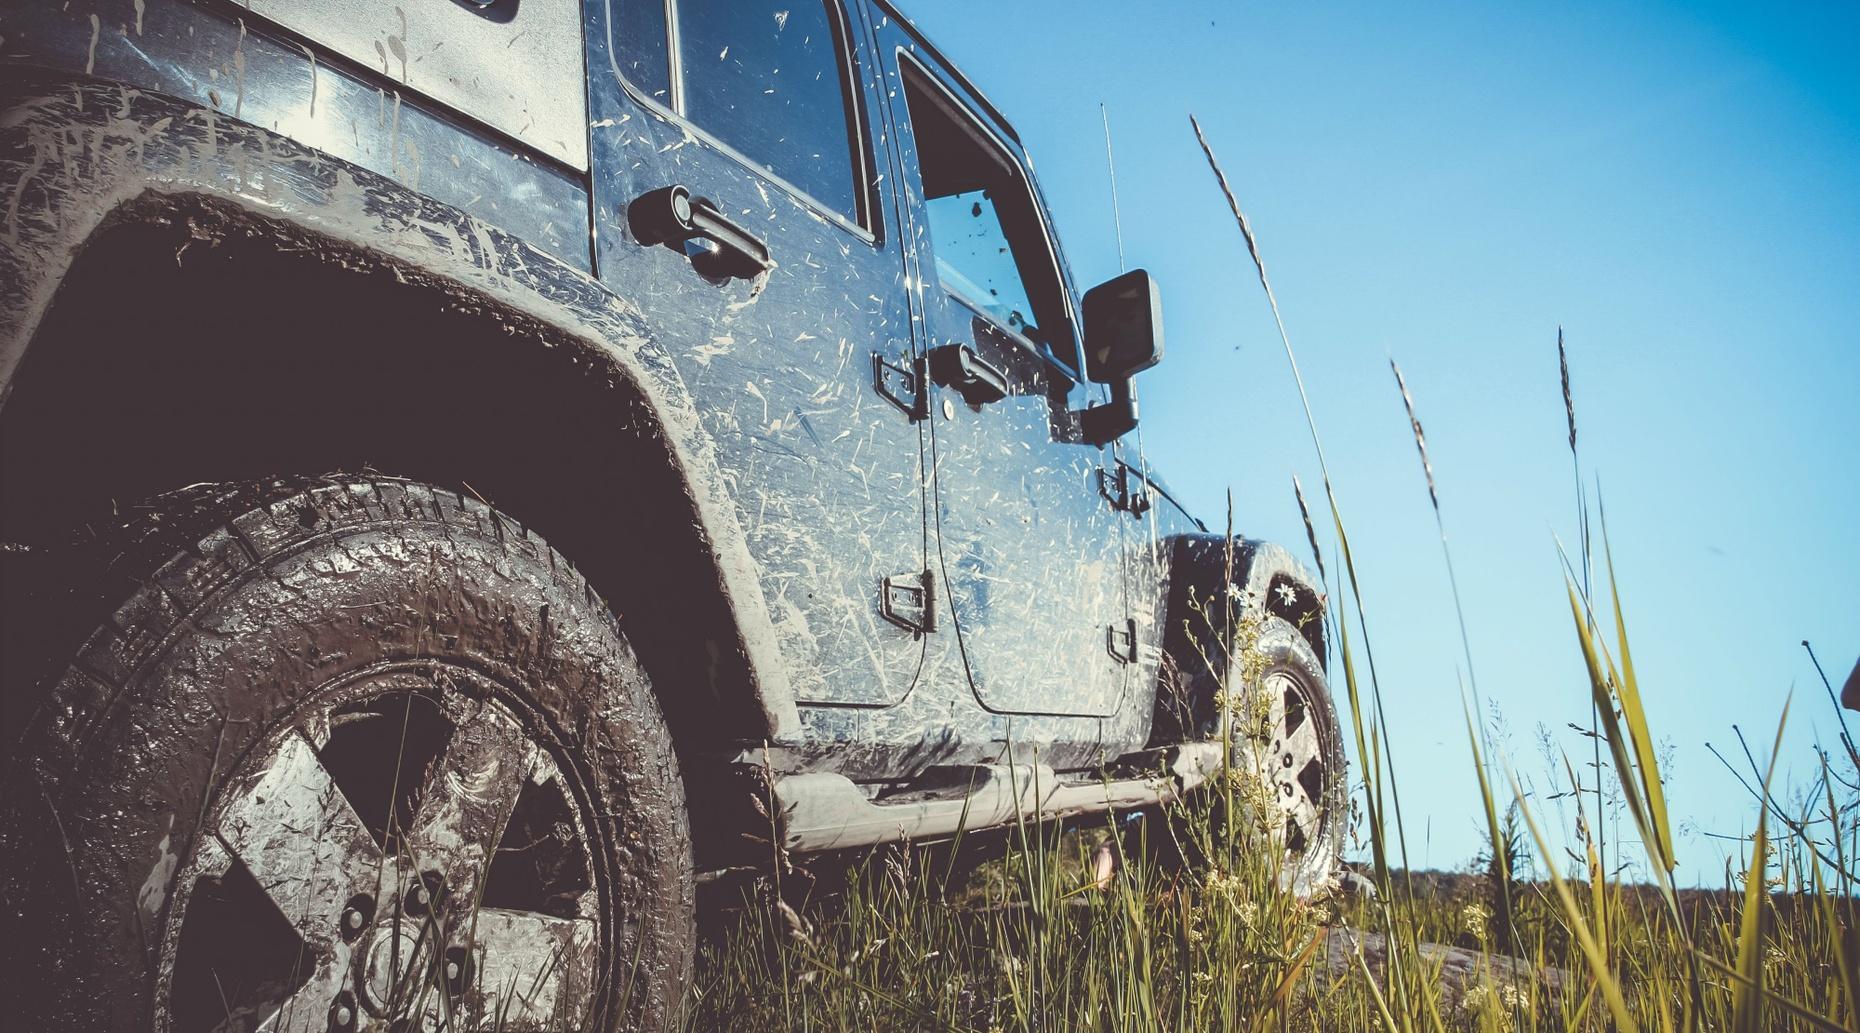 Guided Cripple Creek Jeep Tour